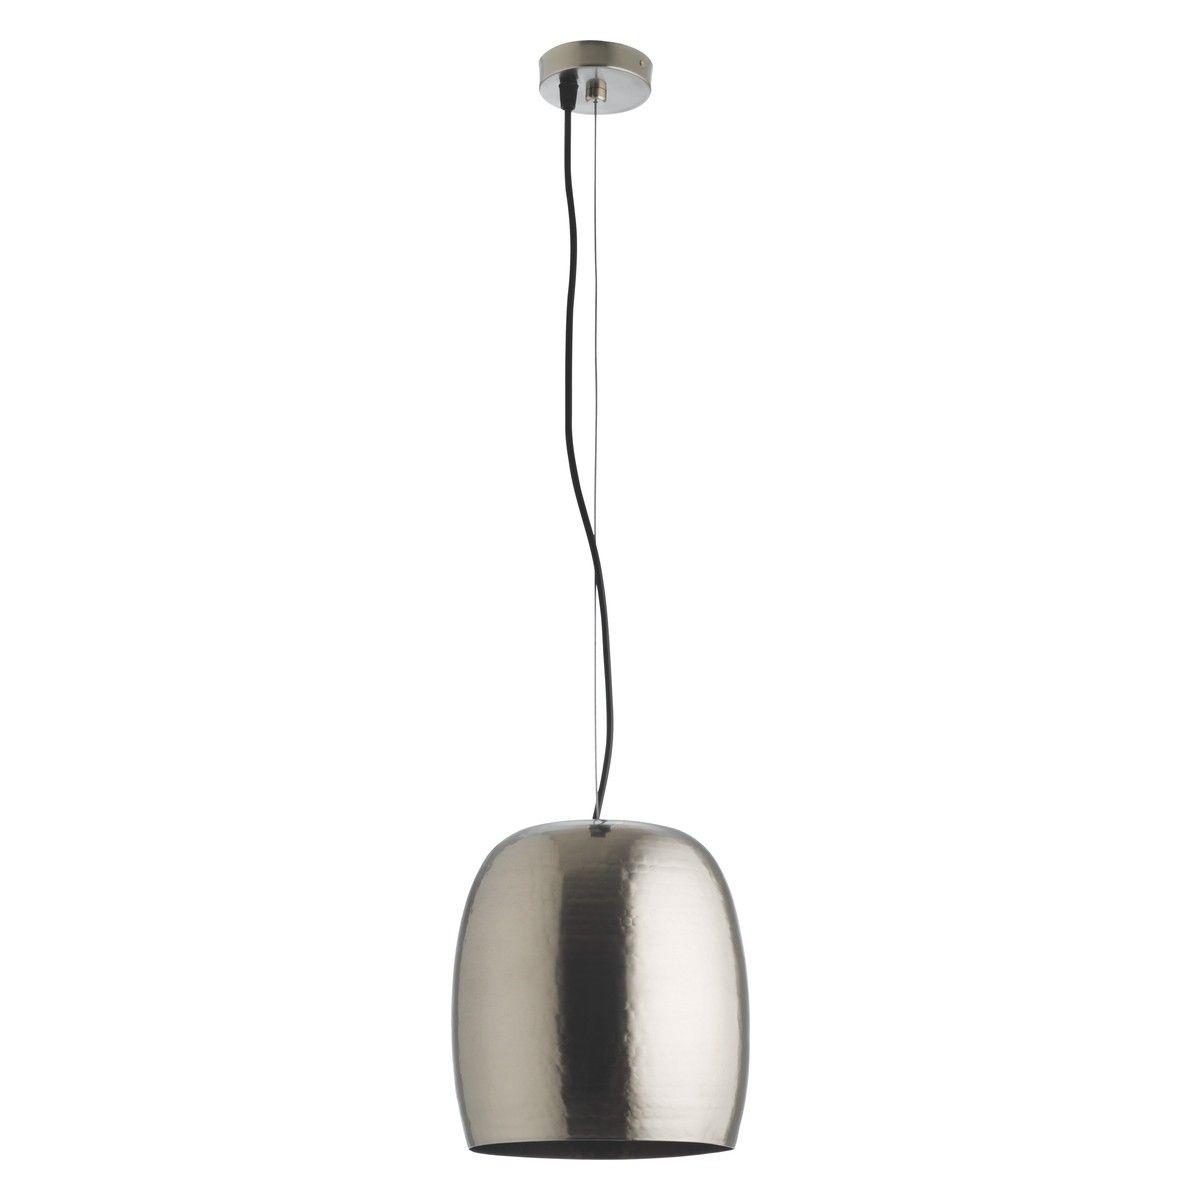 Marteau Pewter Mini Metal Ceiling Light Buy Now At Habitat Uk